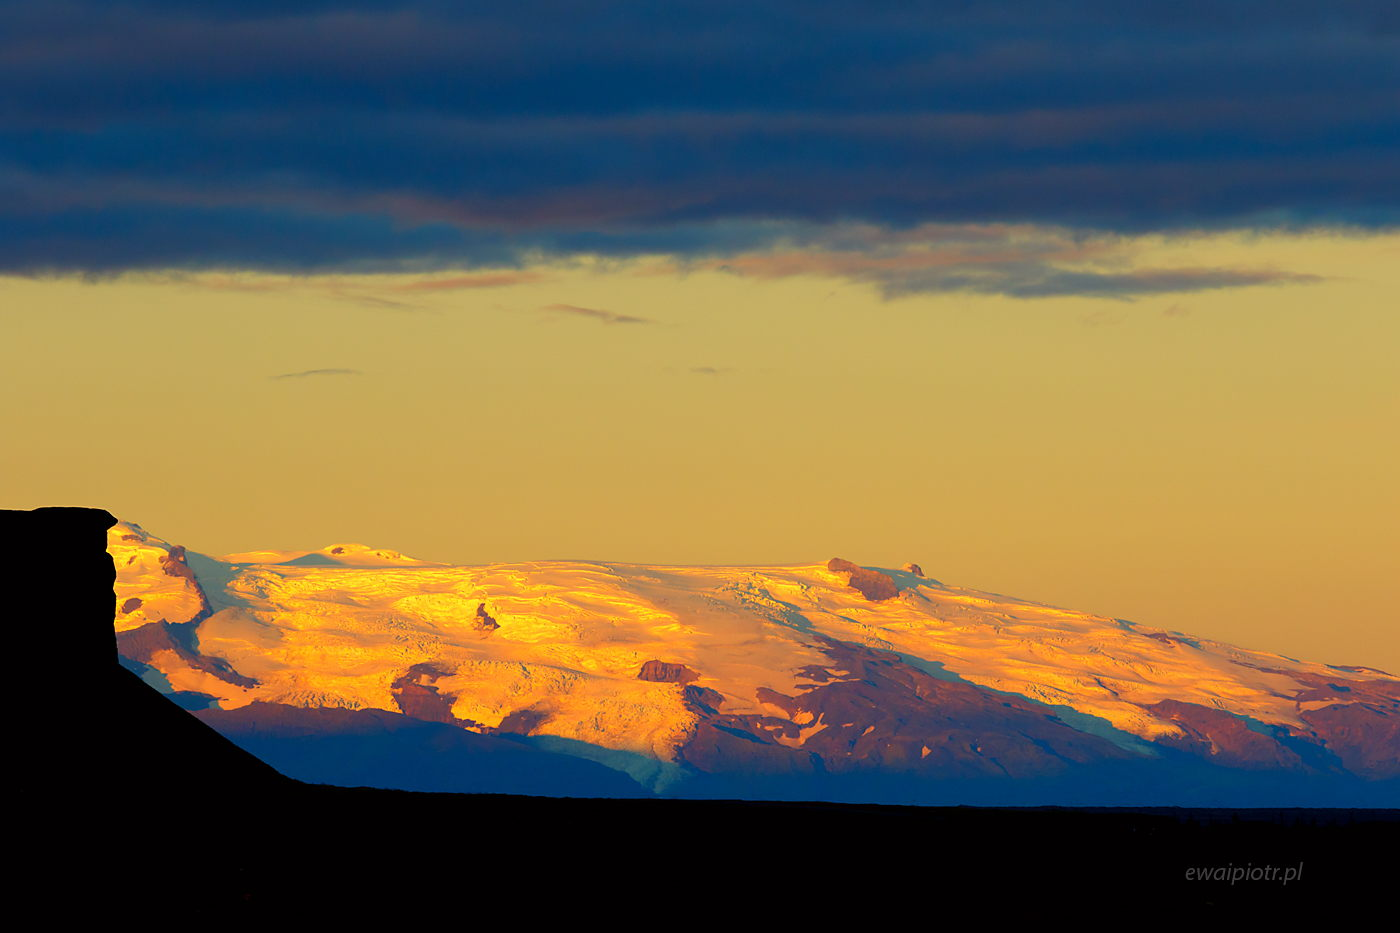 Zachód nad lodowcem, Islandia